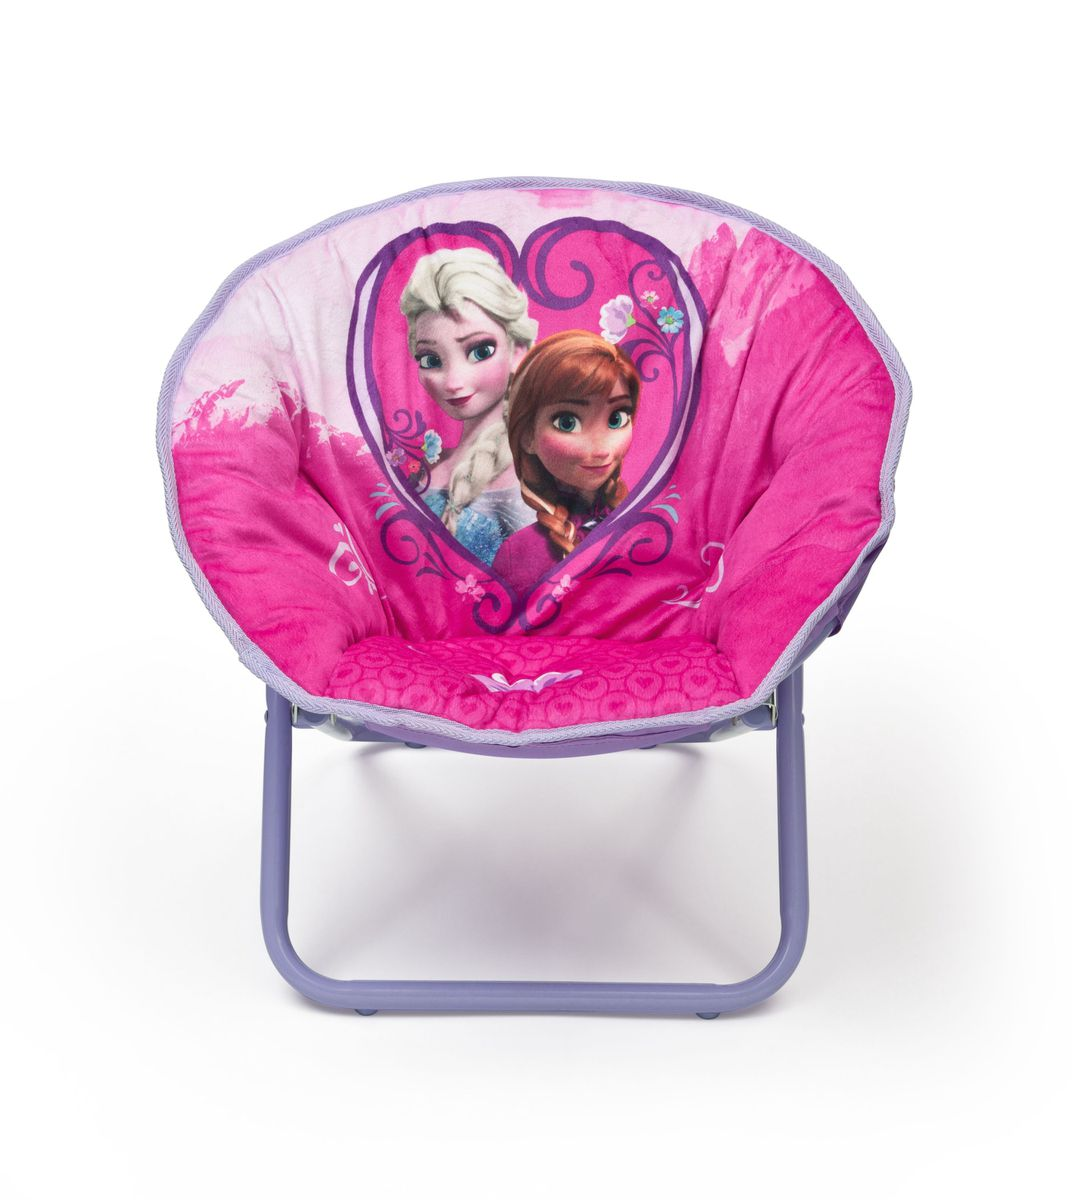 Purple saucer chair - Disney Frozen Saucer Chair Purple Loading Zoom